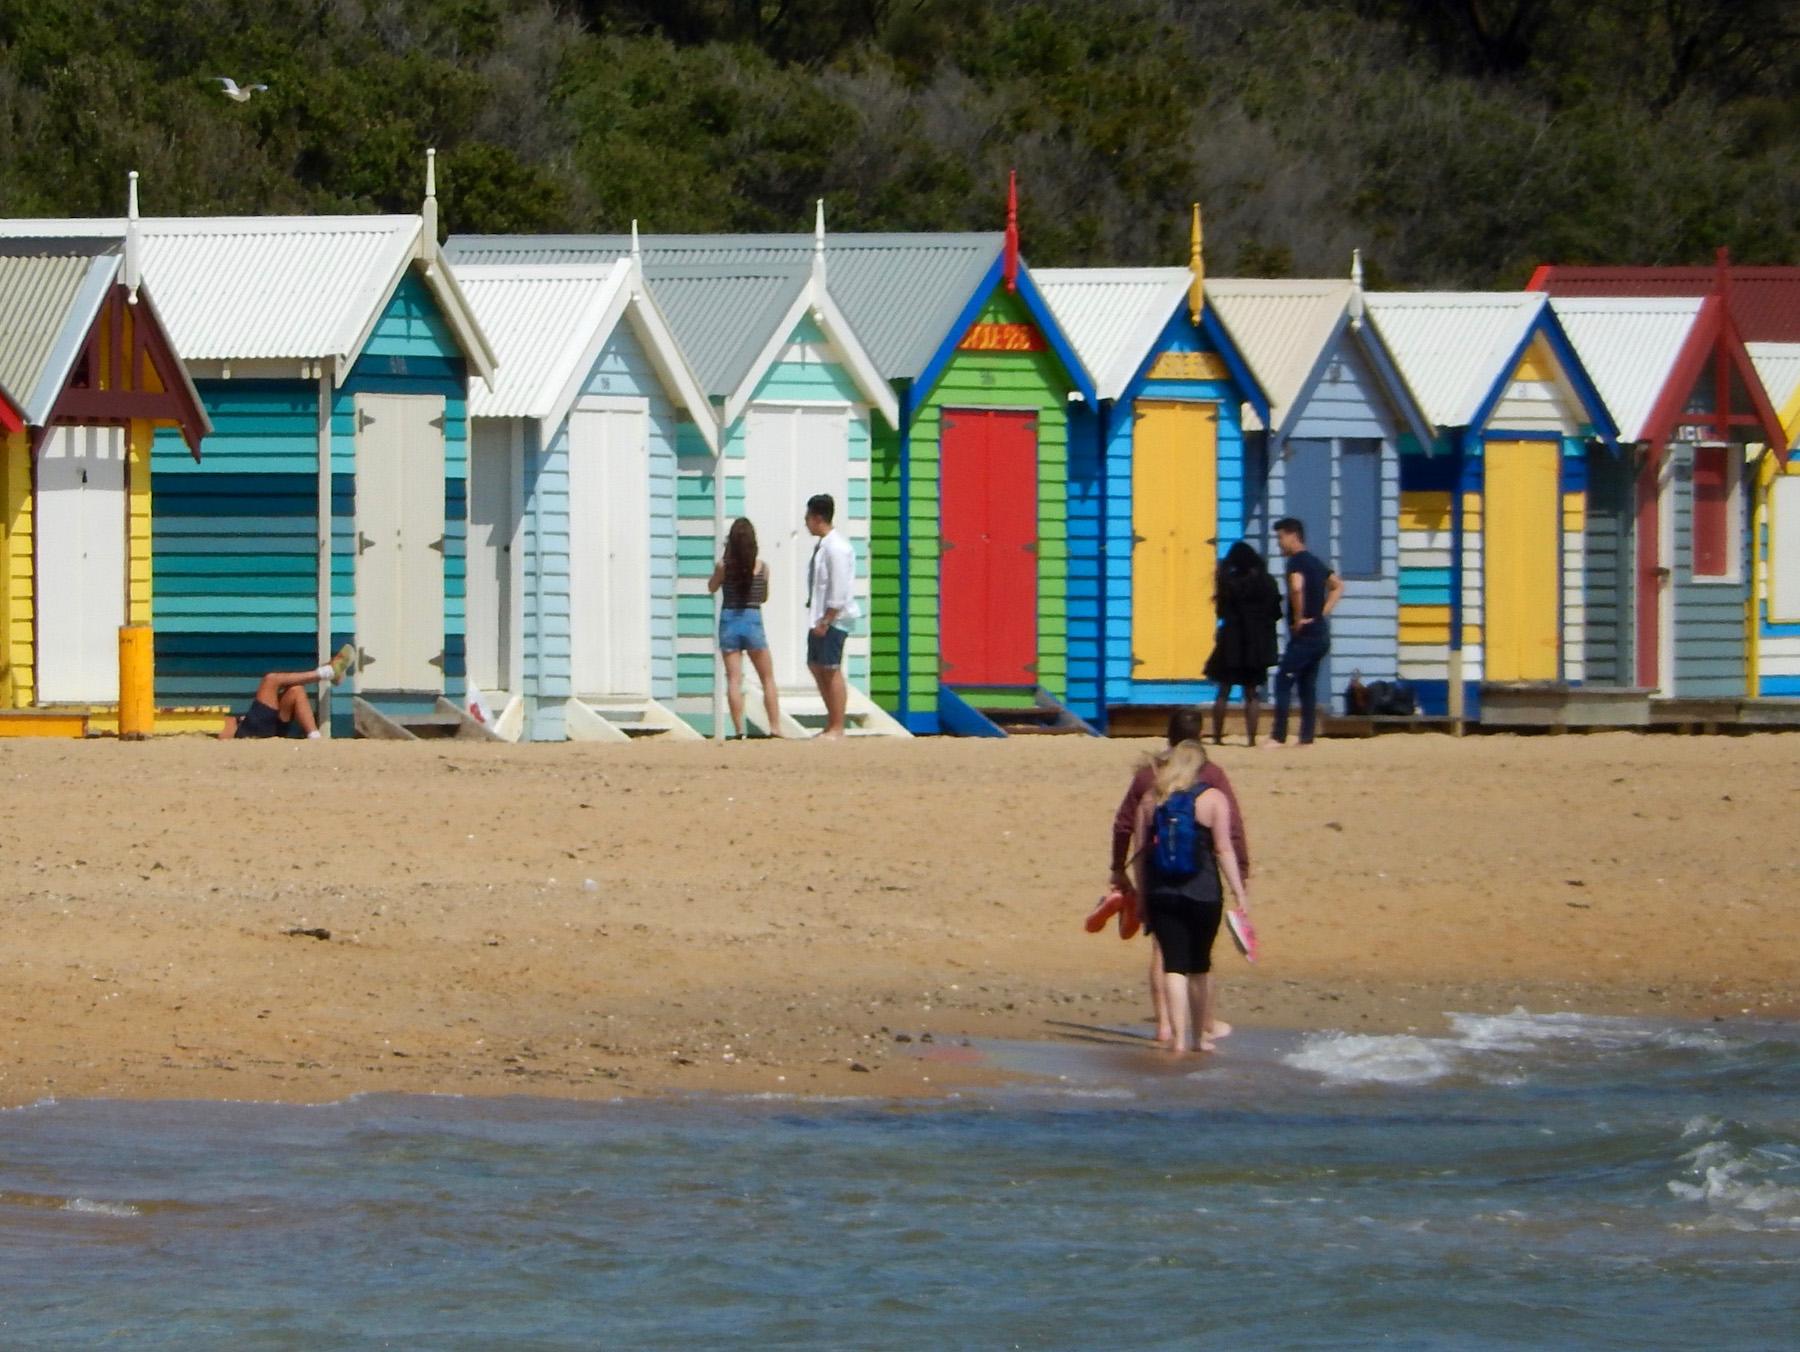 BrightonBoxesRGB.jpg